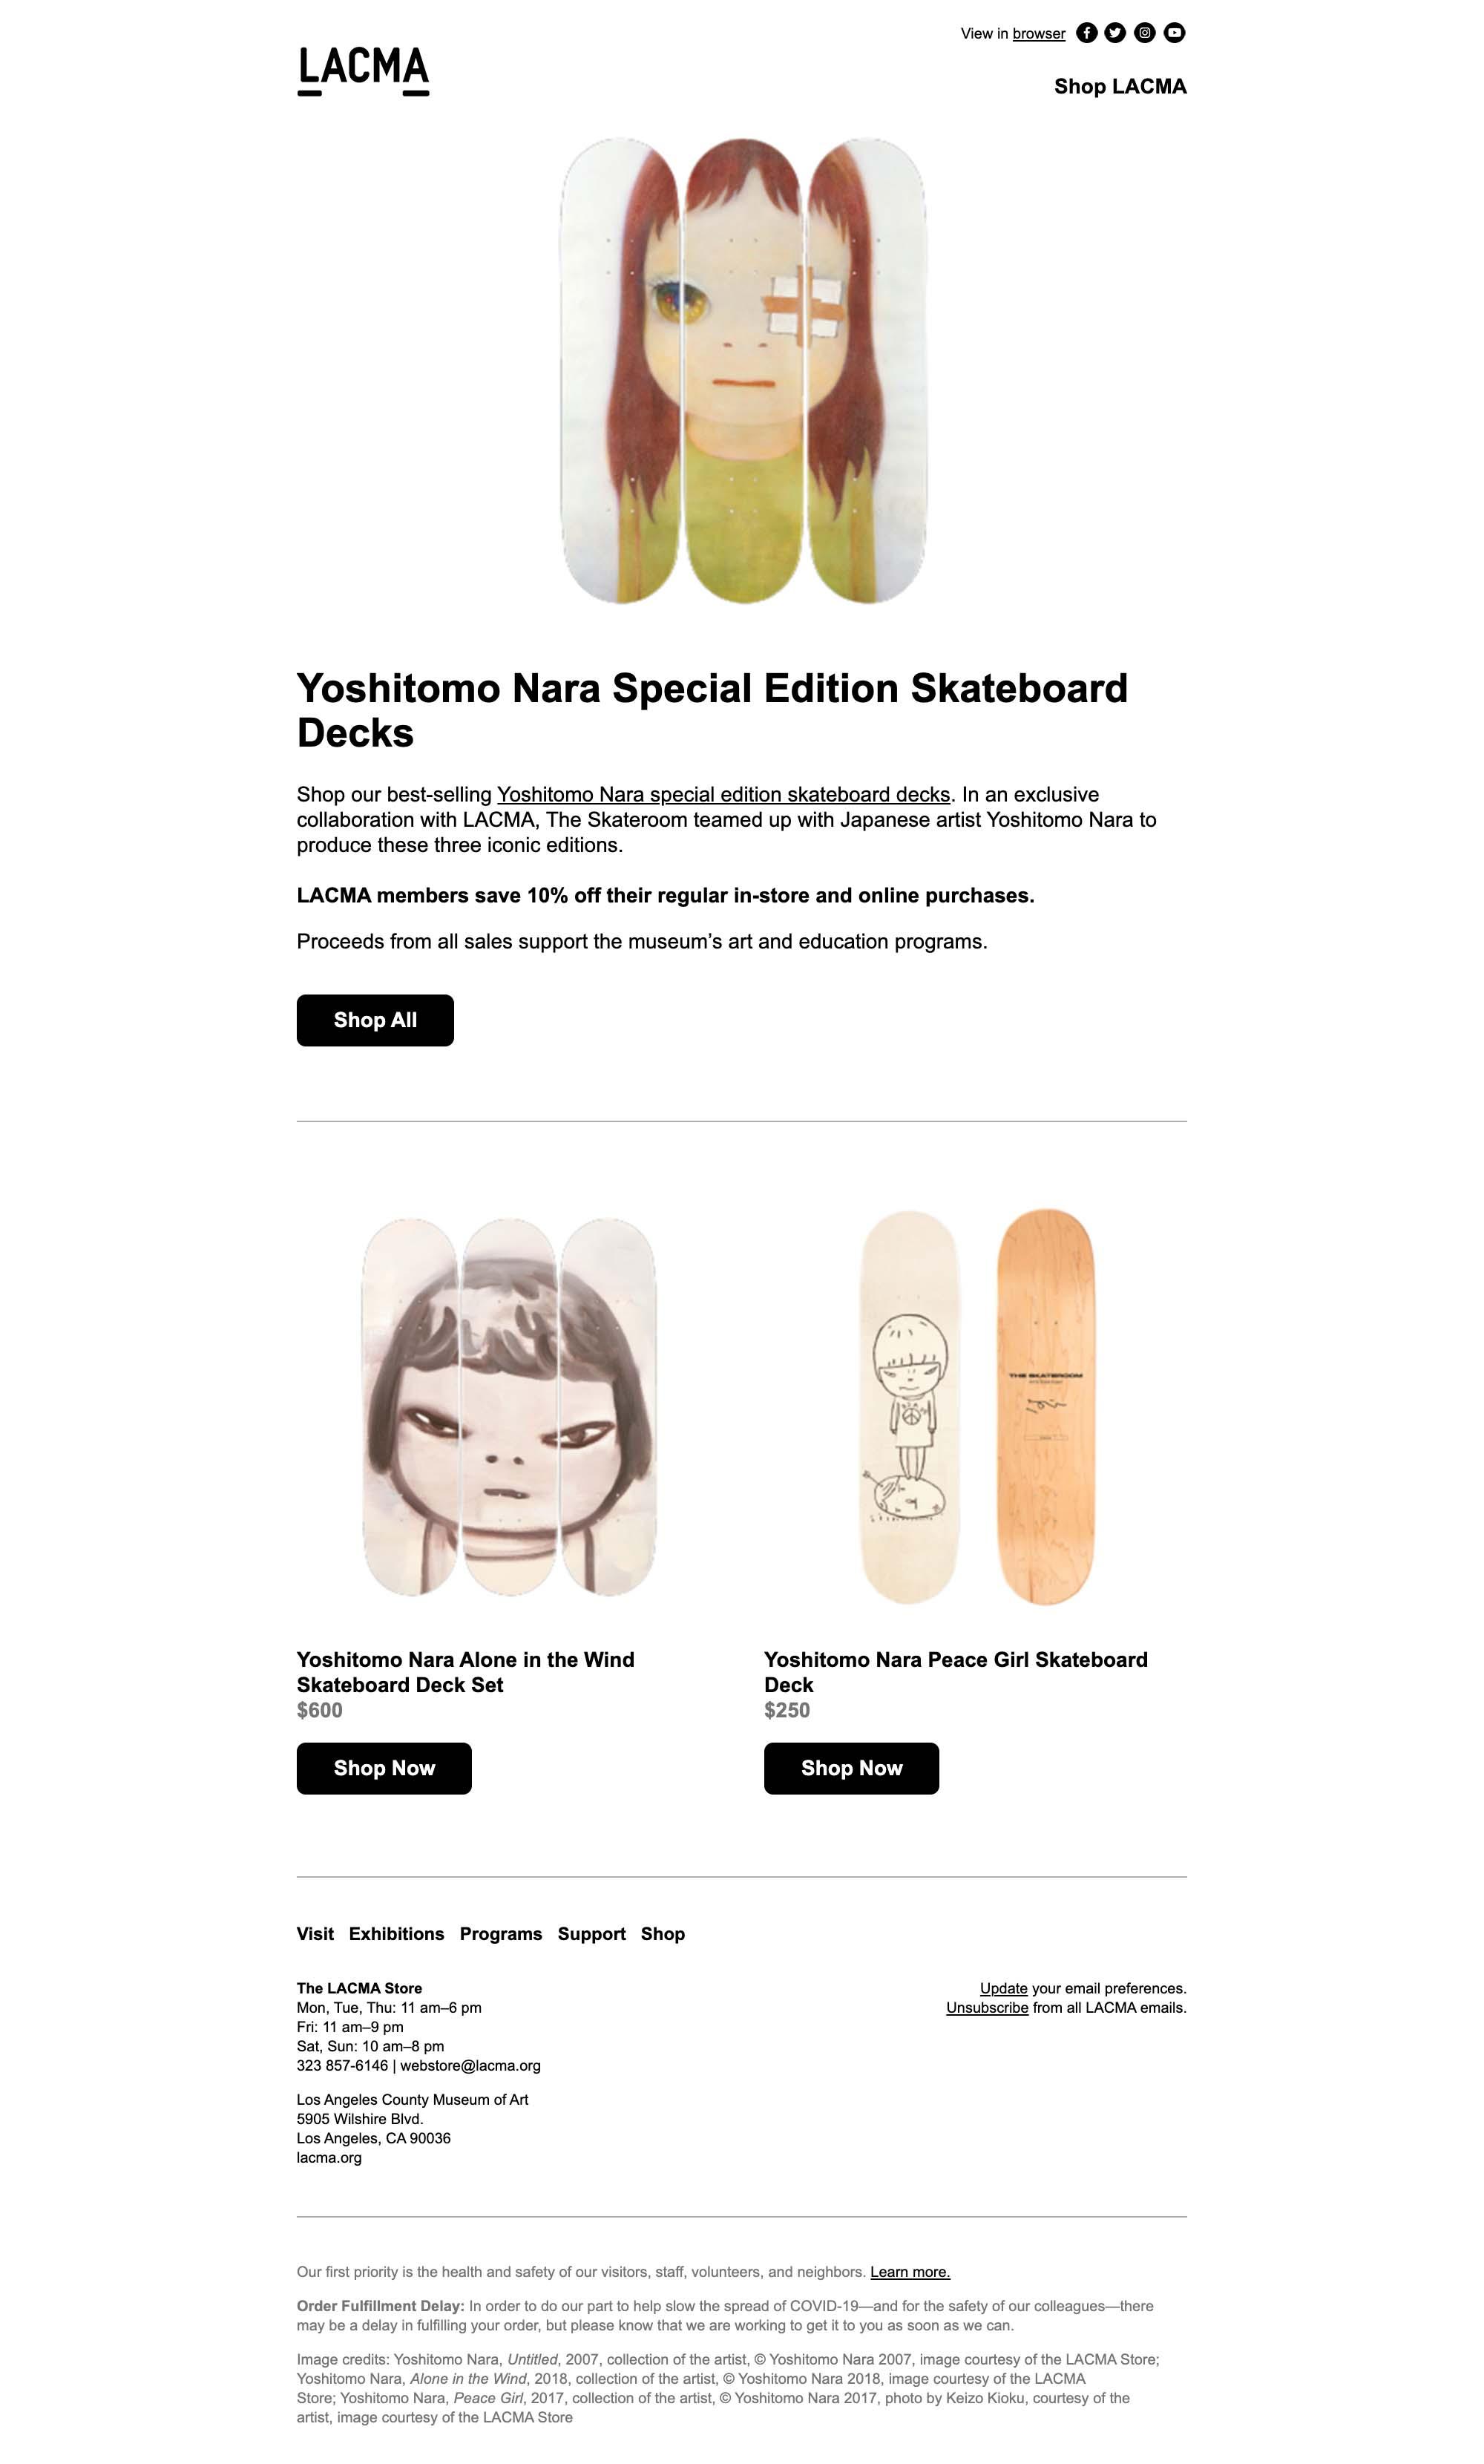 LACMA Store: Yoshitomo Nara Skateboard Decks - desktop view